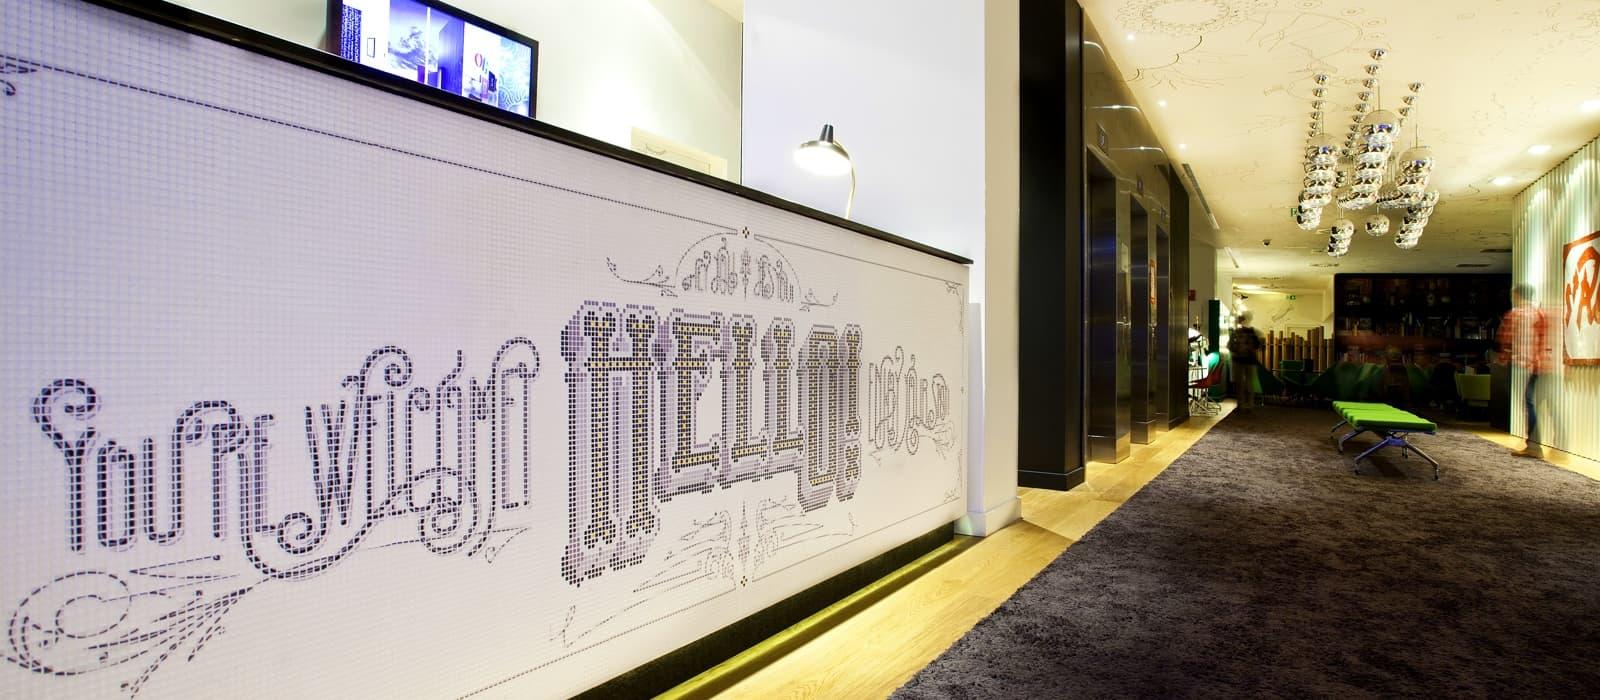 Bit Hôtel Barcelone - Vincci Hoteles